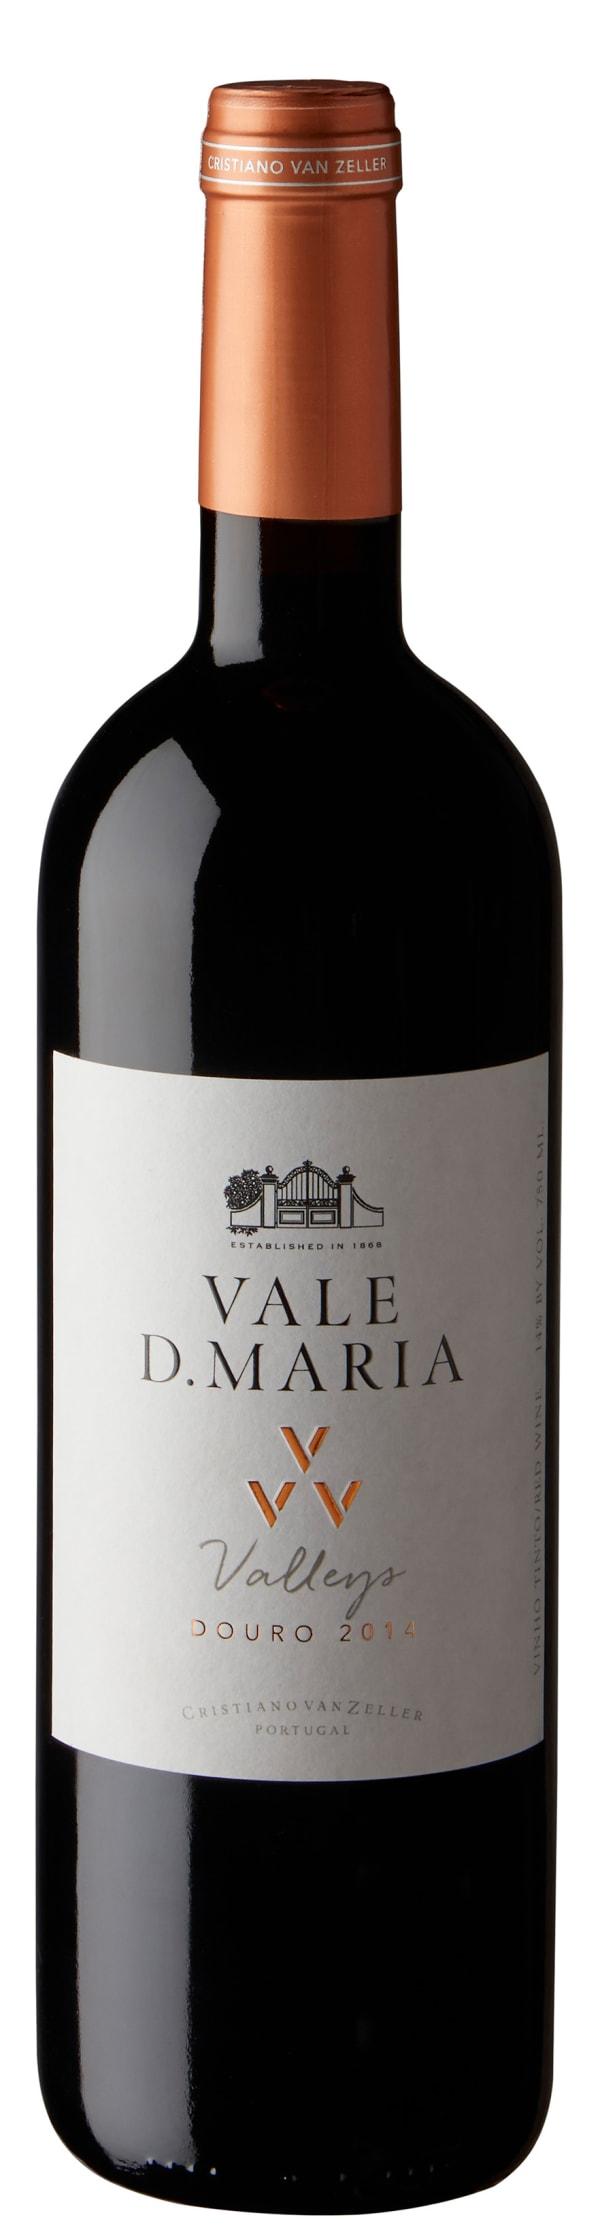 Vale D. Maria VVV Valleys Tinto 2014